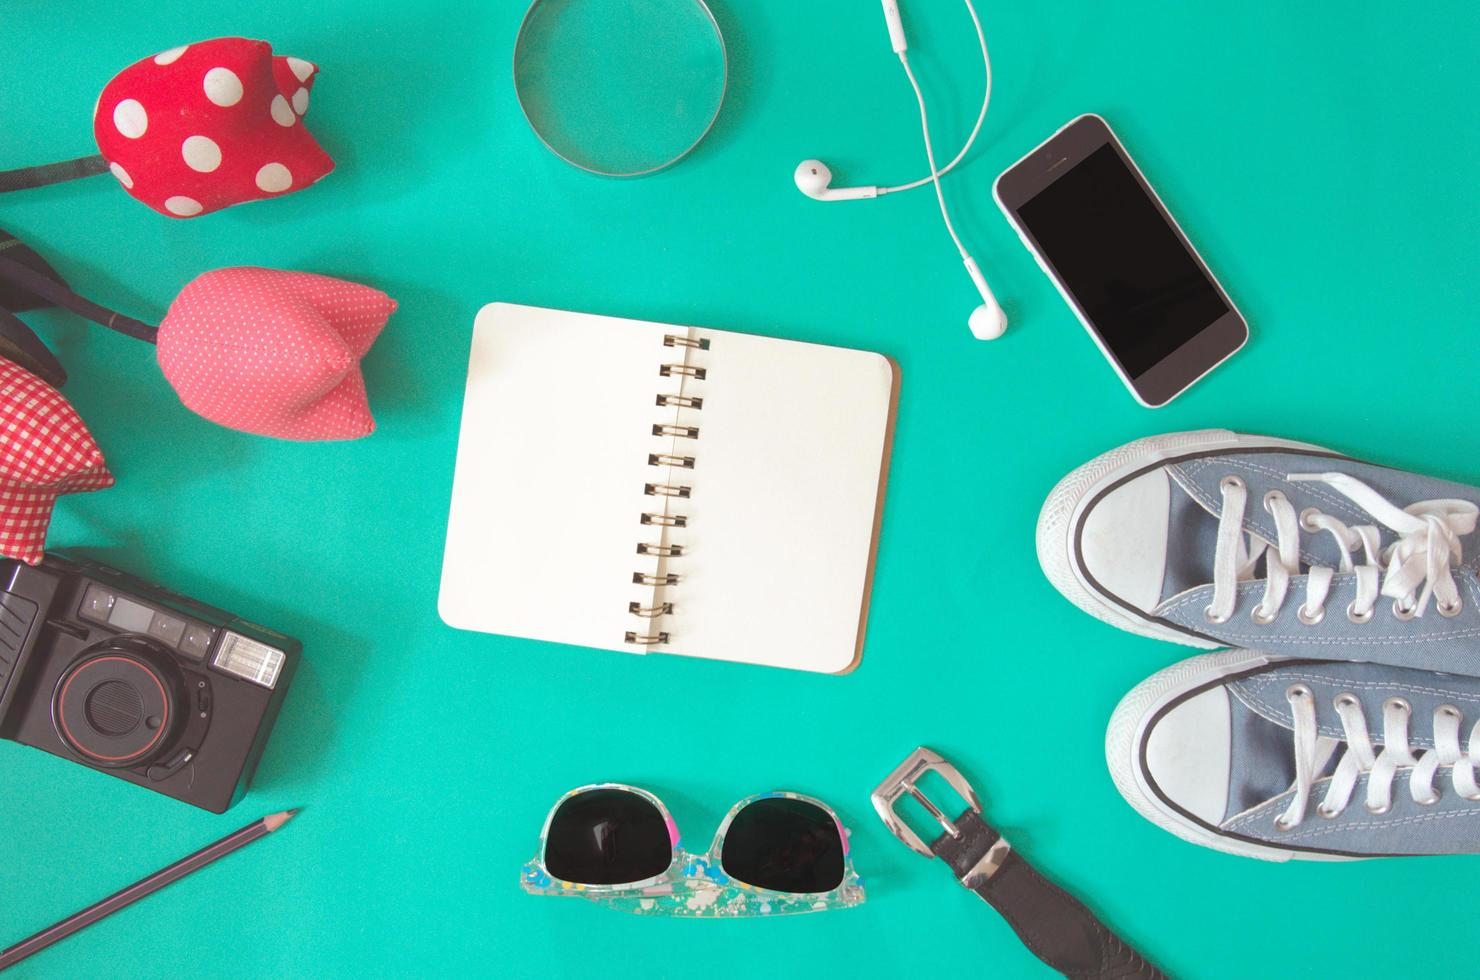 disposizione piatta di notebook, occhiali da sole, fotocamera e converse foto